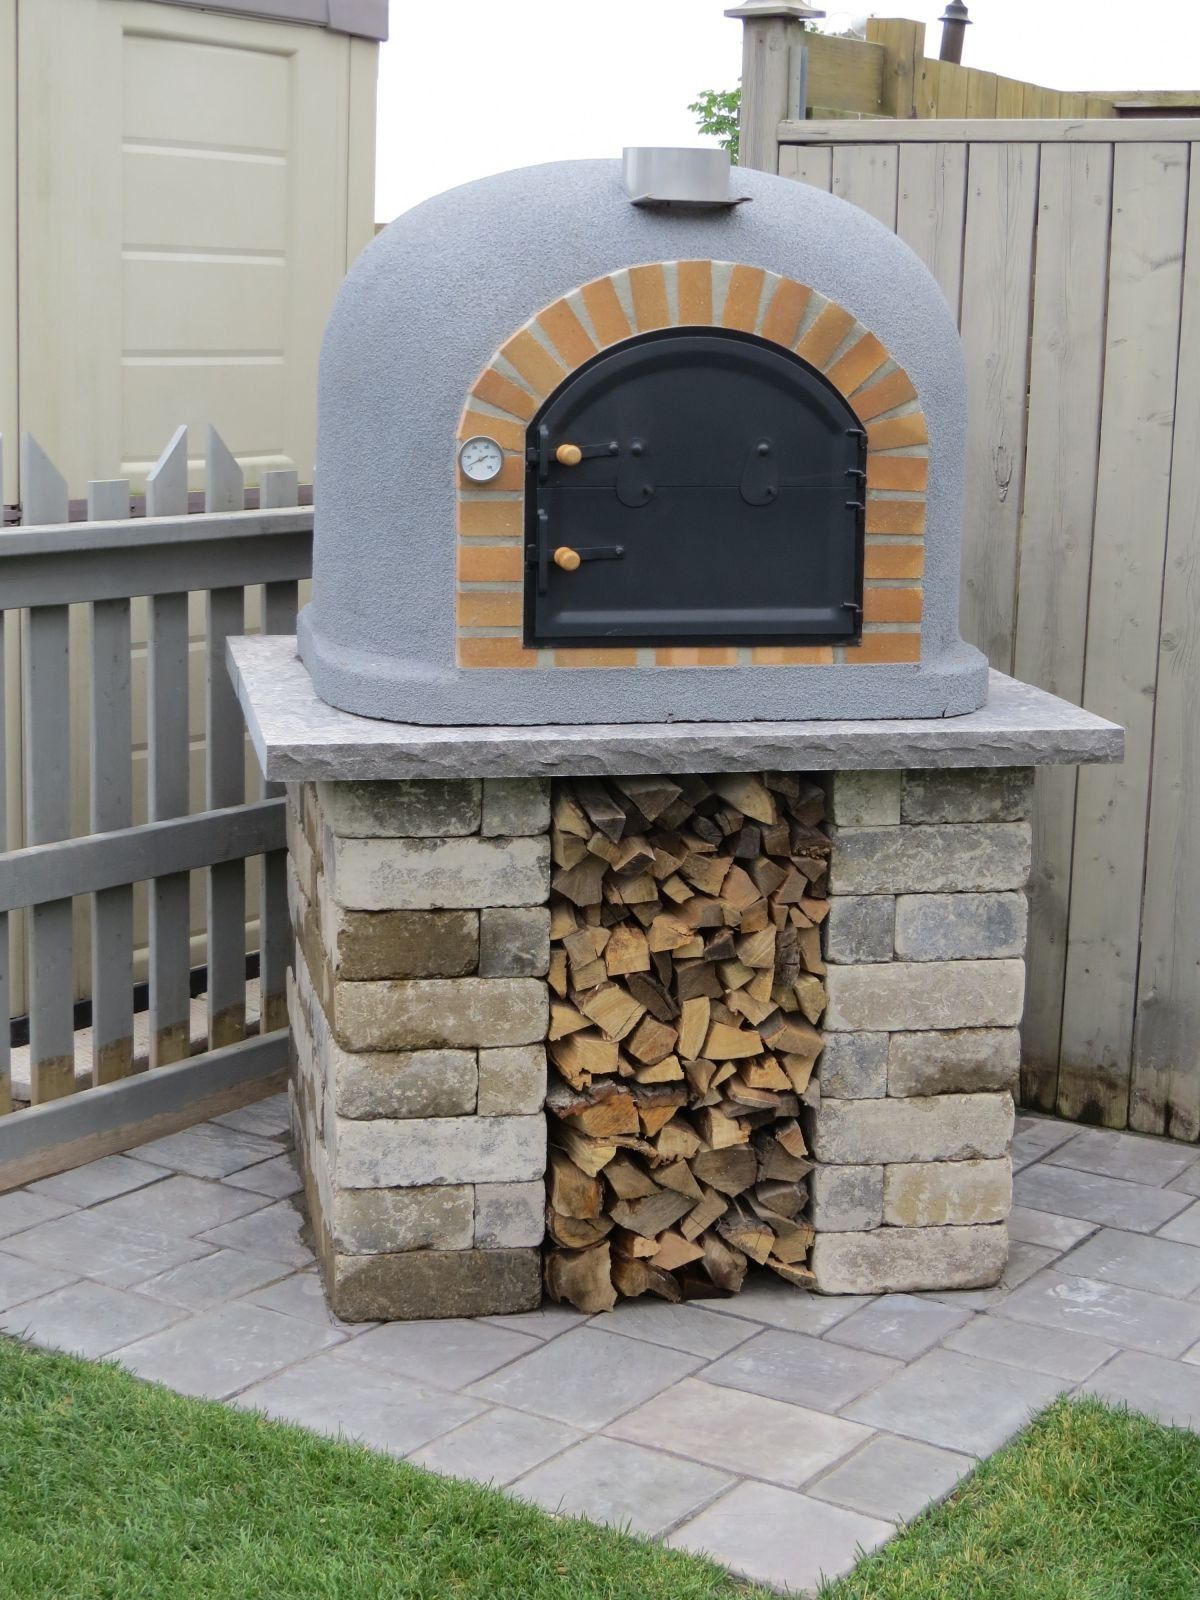 Robot Check Pizza Oven Outdoor Diy Brick Oven Outdoor Pizza